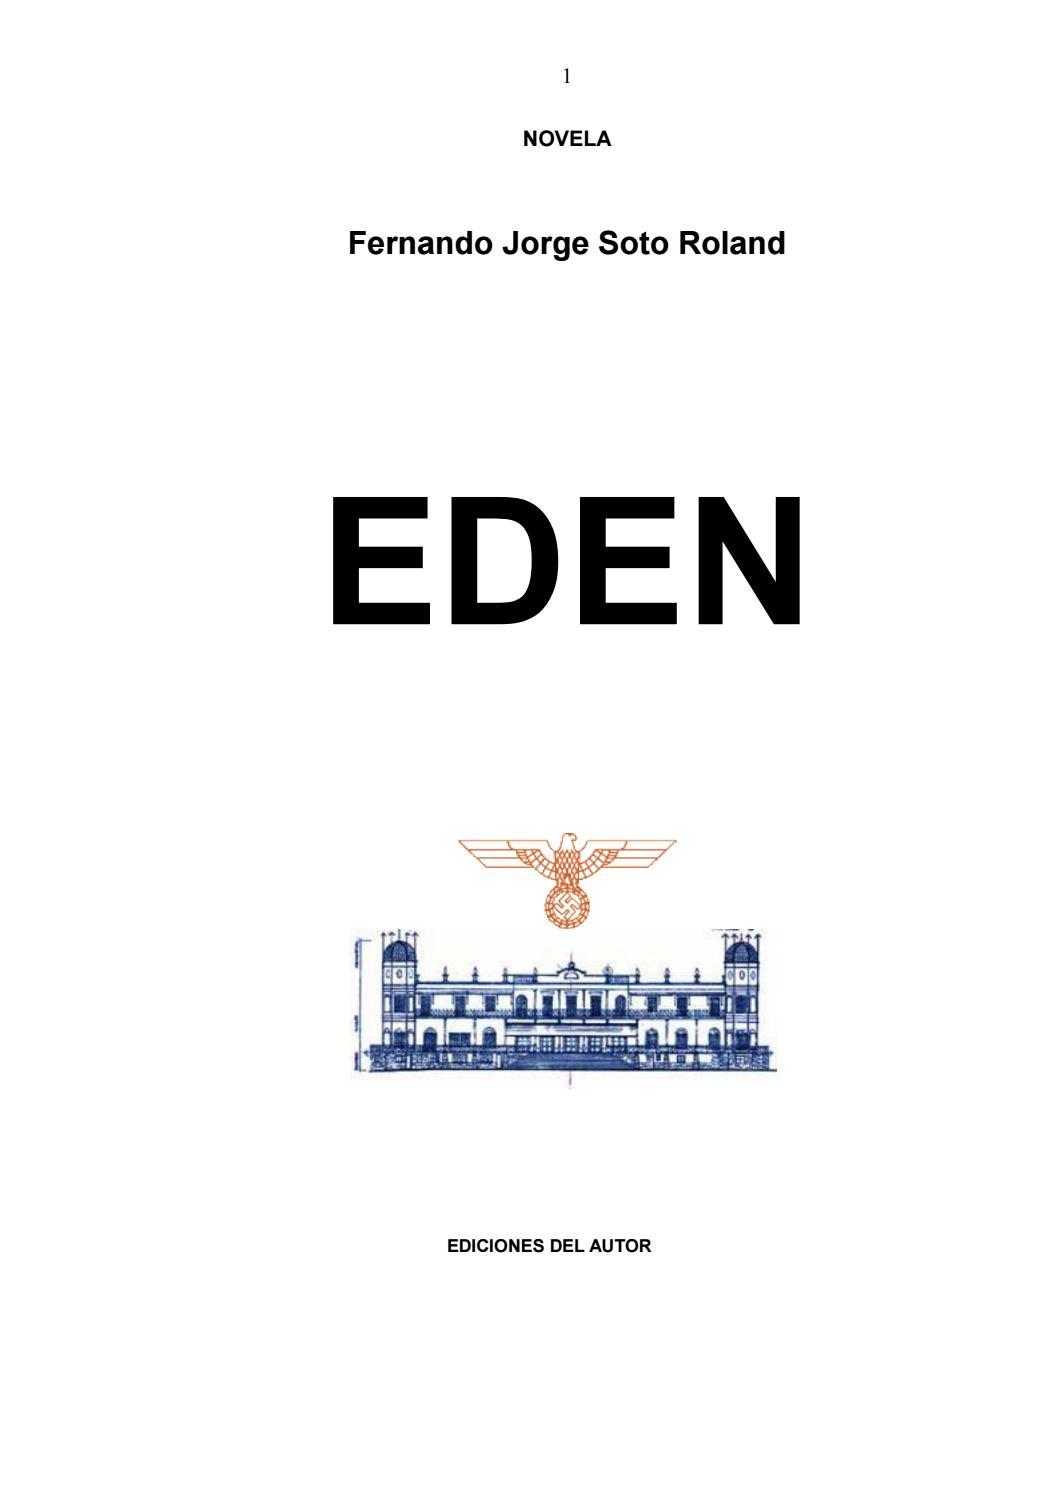 EDEN (NOVELA) by Fernando Jorge Soto Roland - issuu